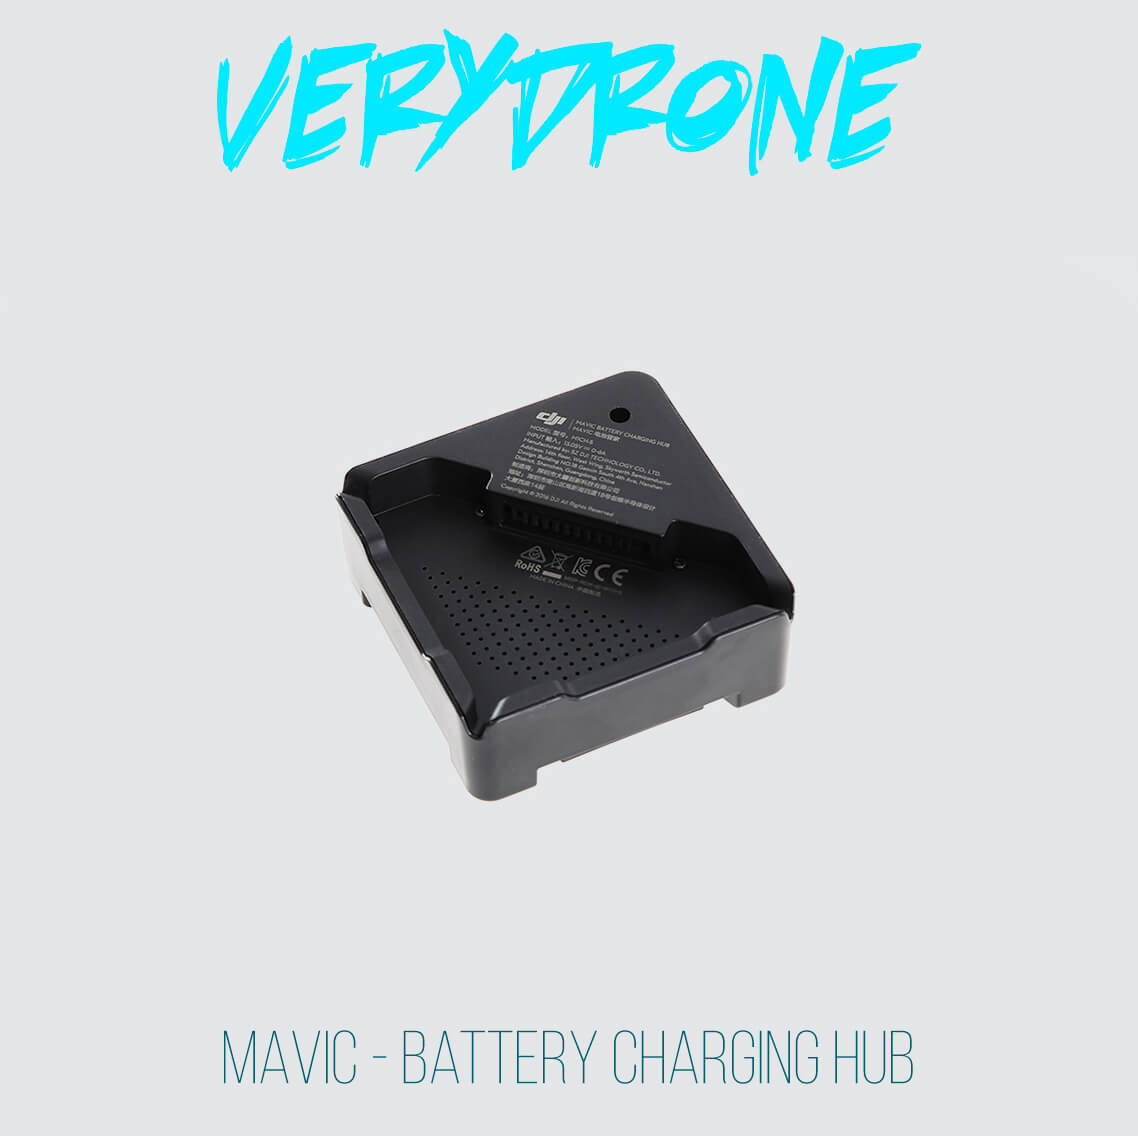 Mavic - Battery Charging Hub